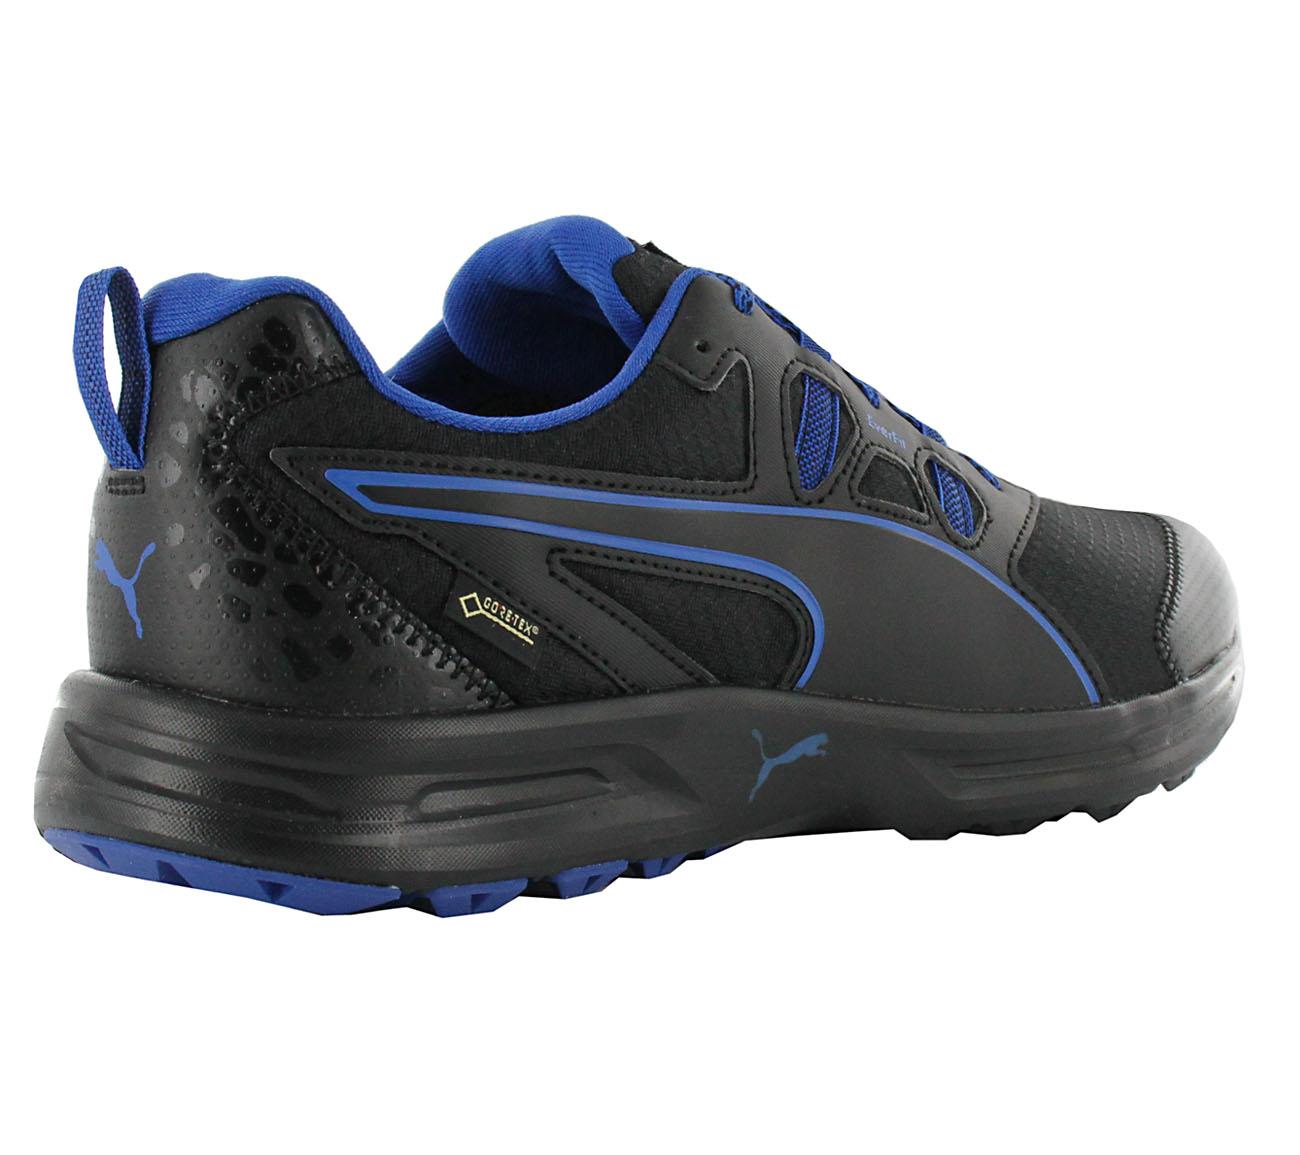 3ea01406 Details about Puma Essential Trail GTX Gore-Tex Shoes Men's Hiking Shoes  Running Shoes Black